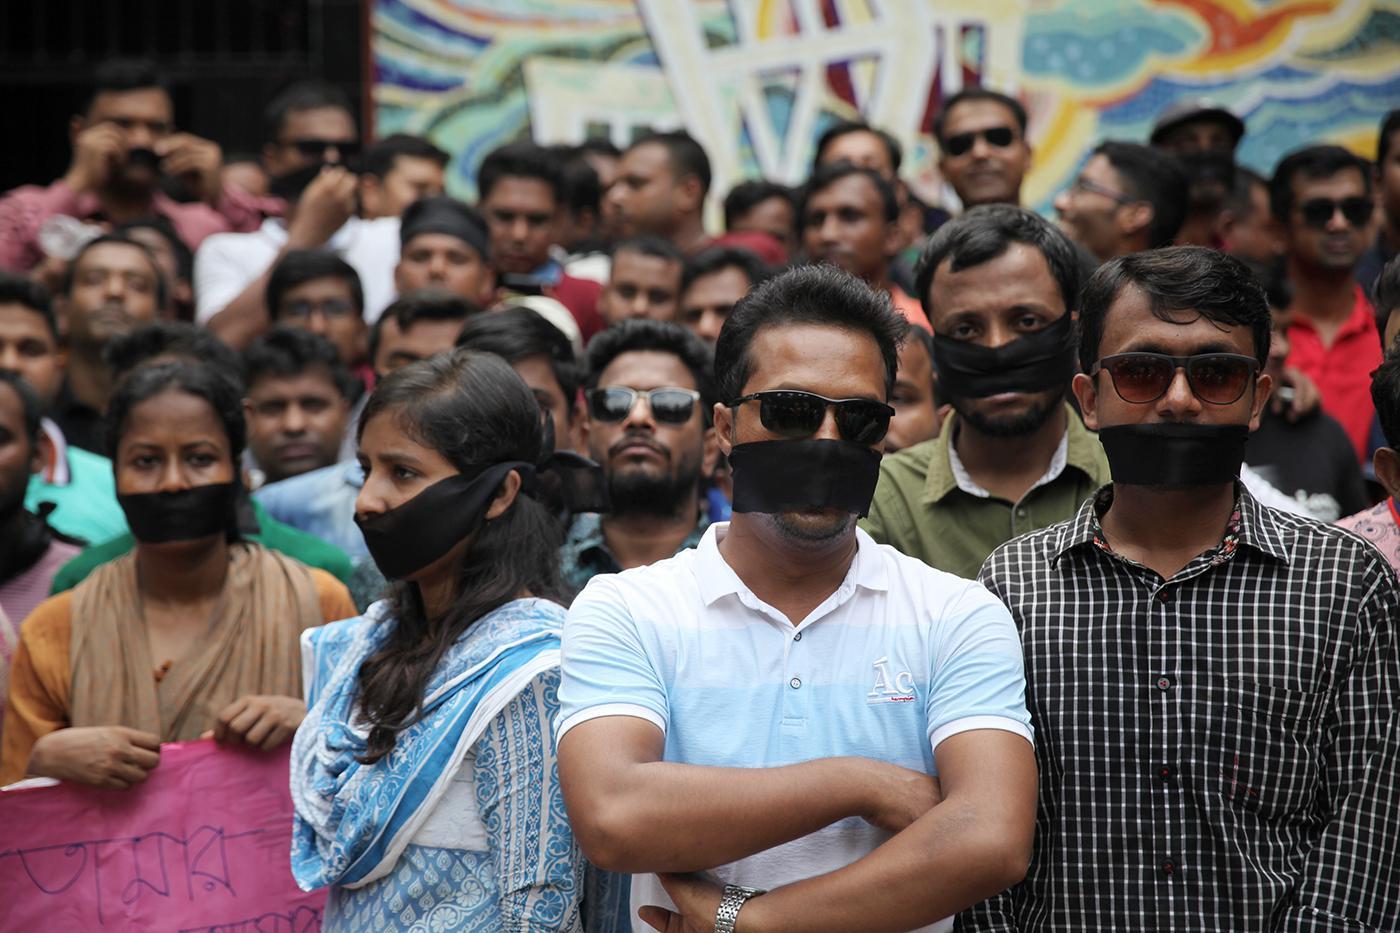 Bangladesh: Crackdown on Critics, Activists | Human Rights Watch